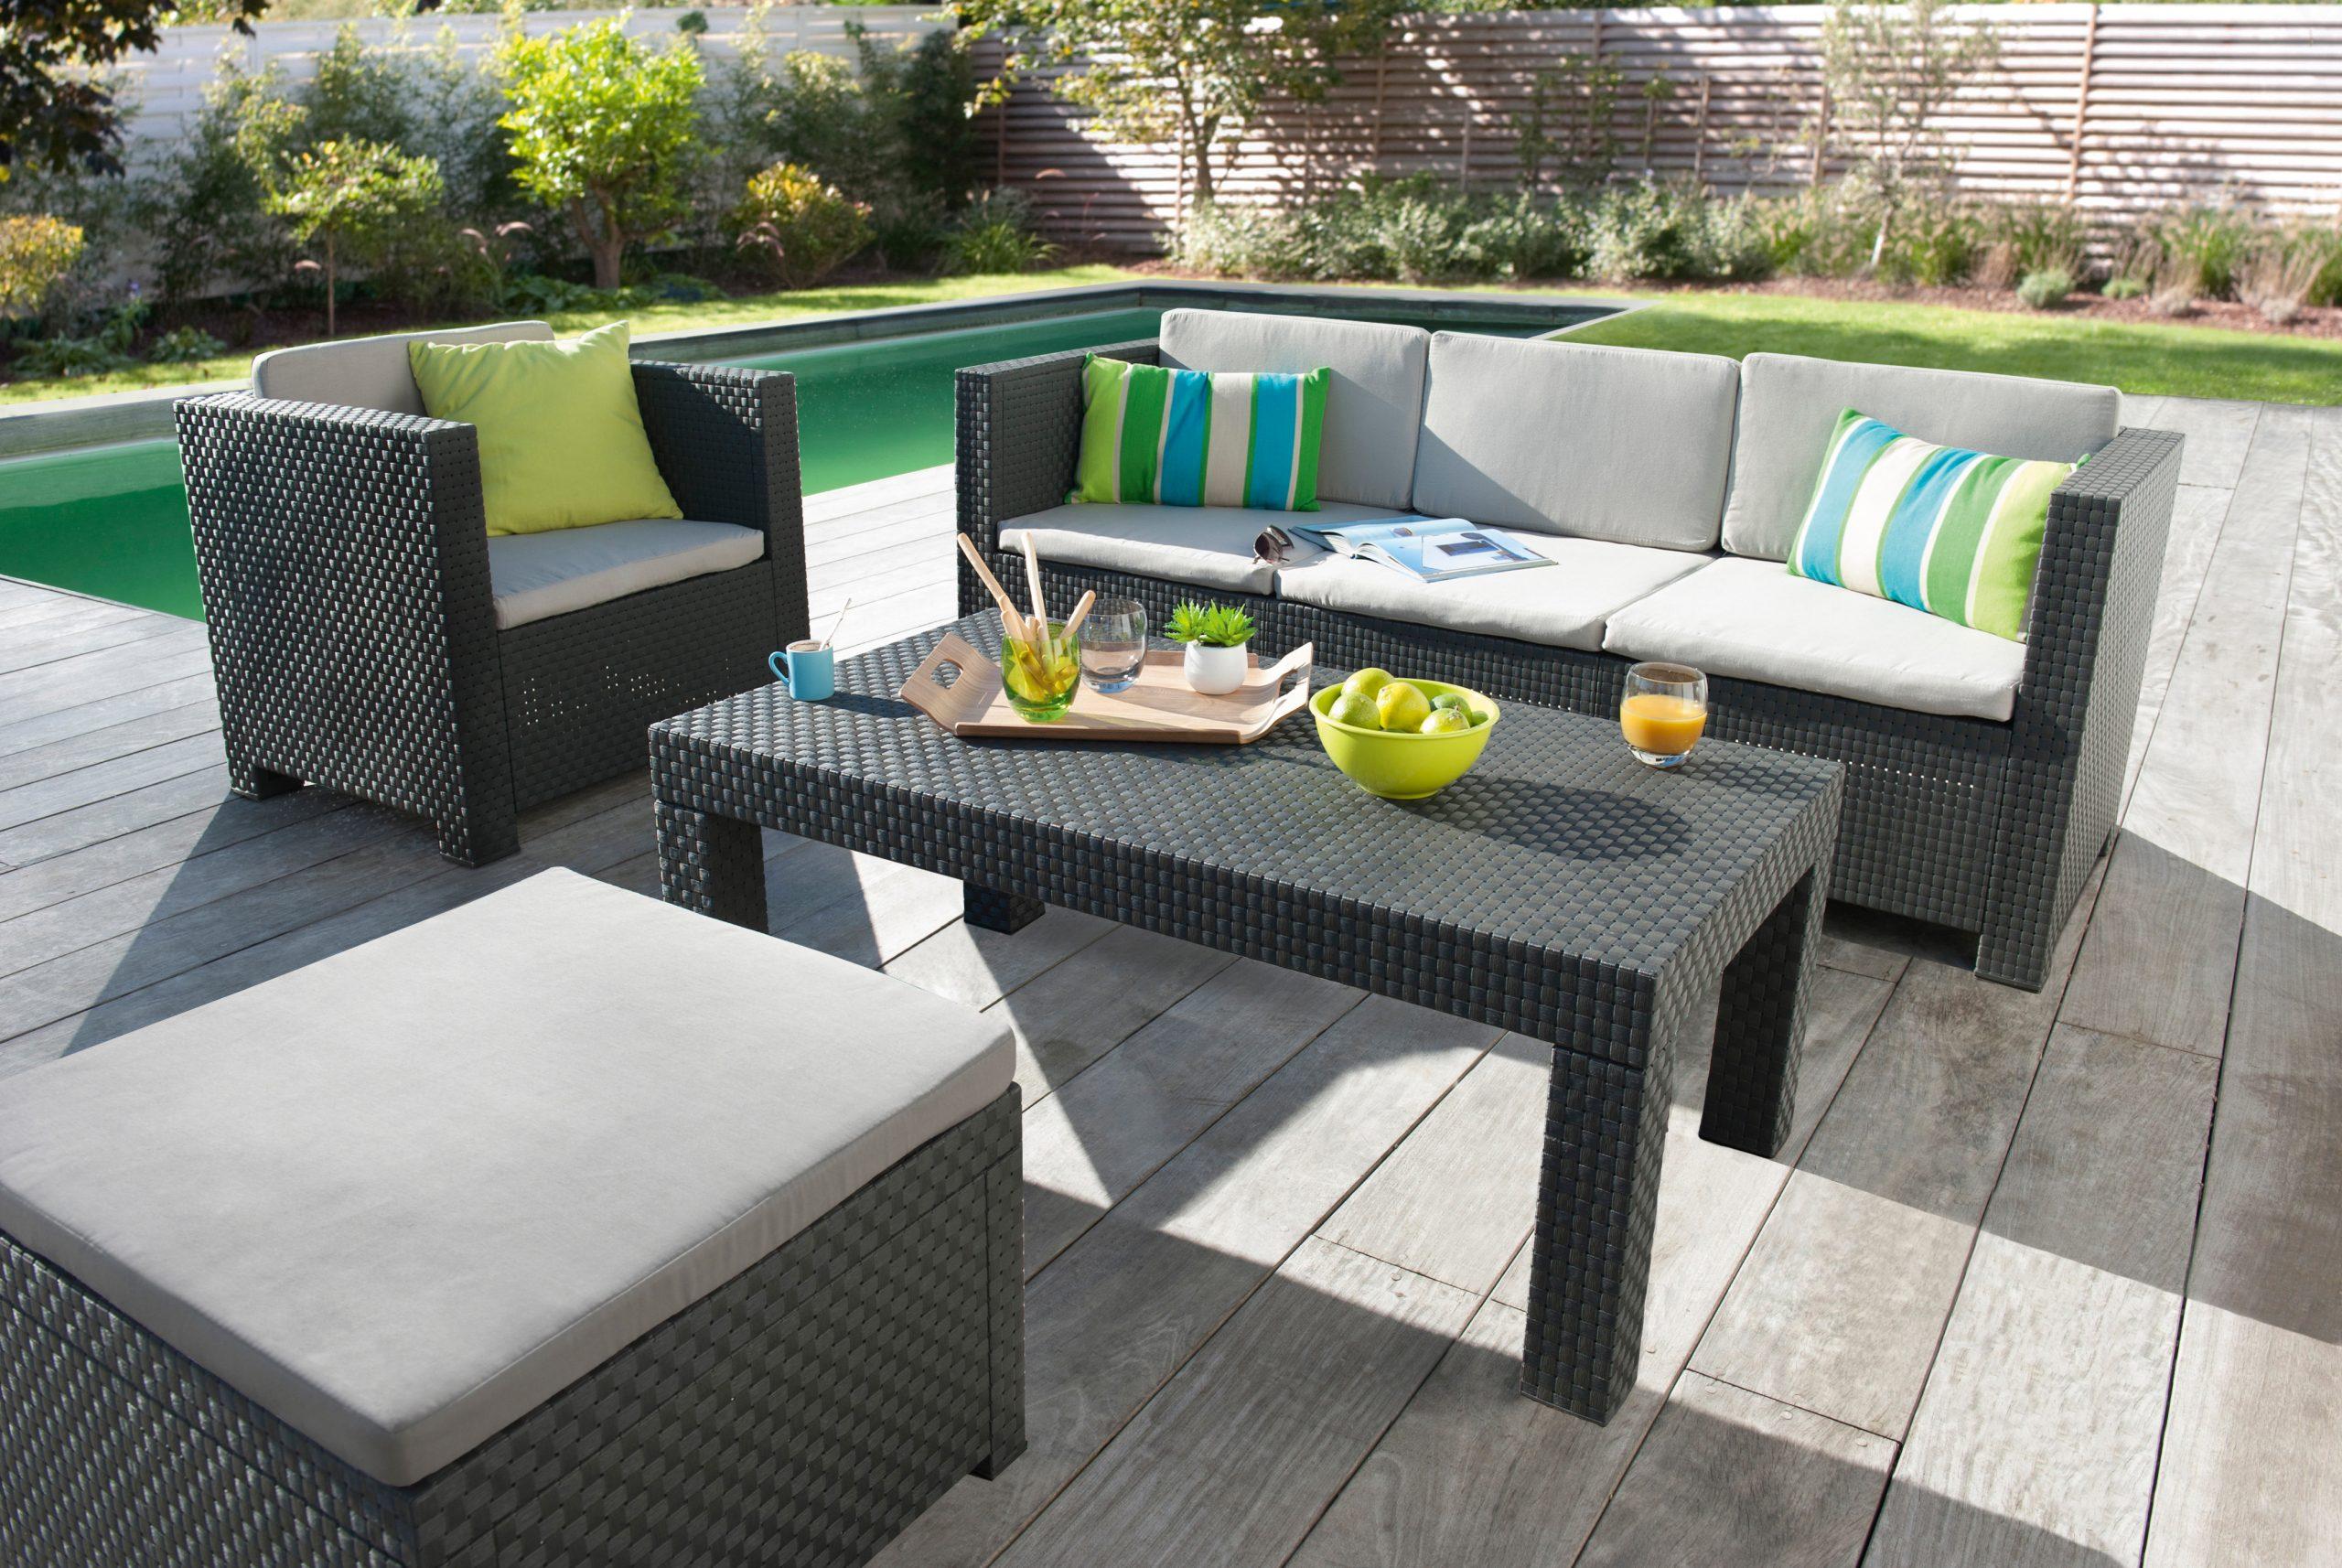 Salon De Jardin Design - Idées Salon De Jardin Confortable ... avec Canapé De Jardin Pas Cher